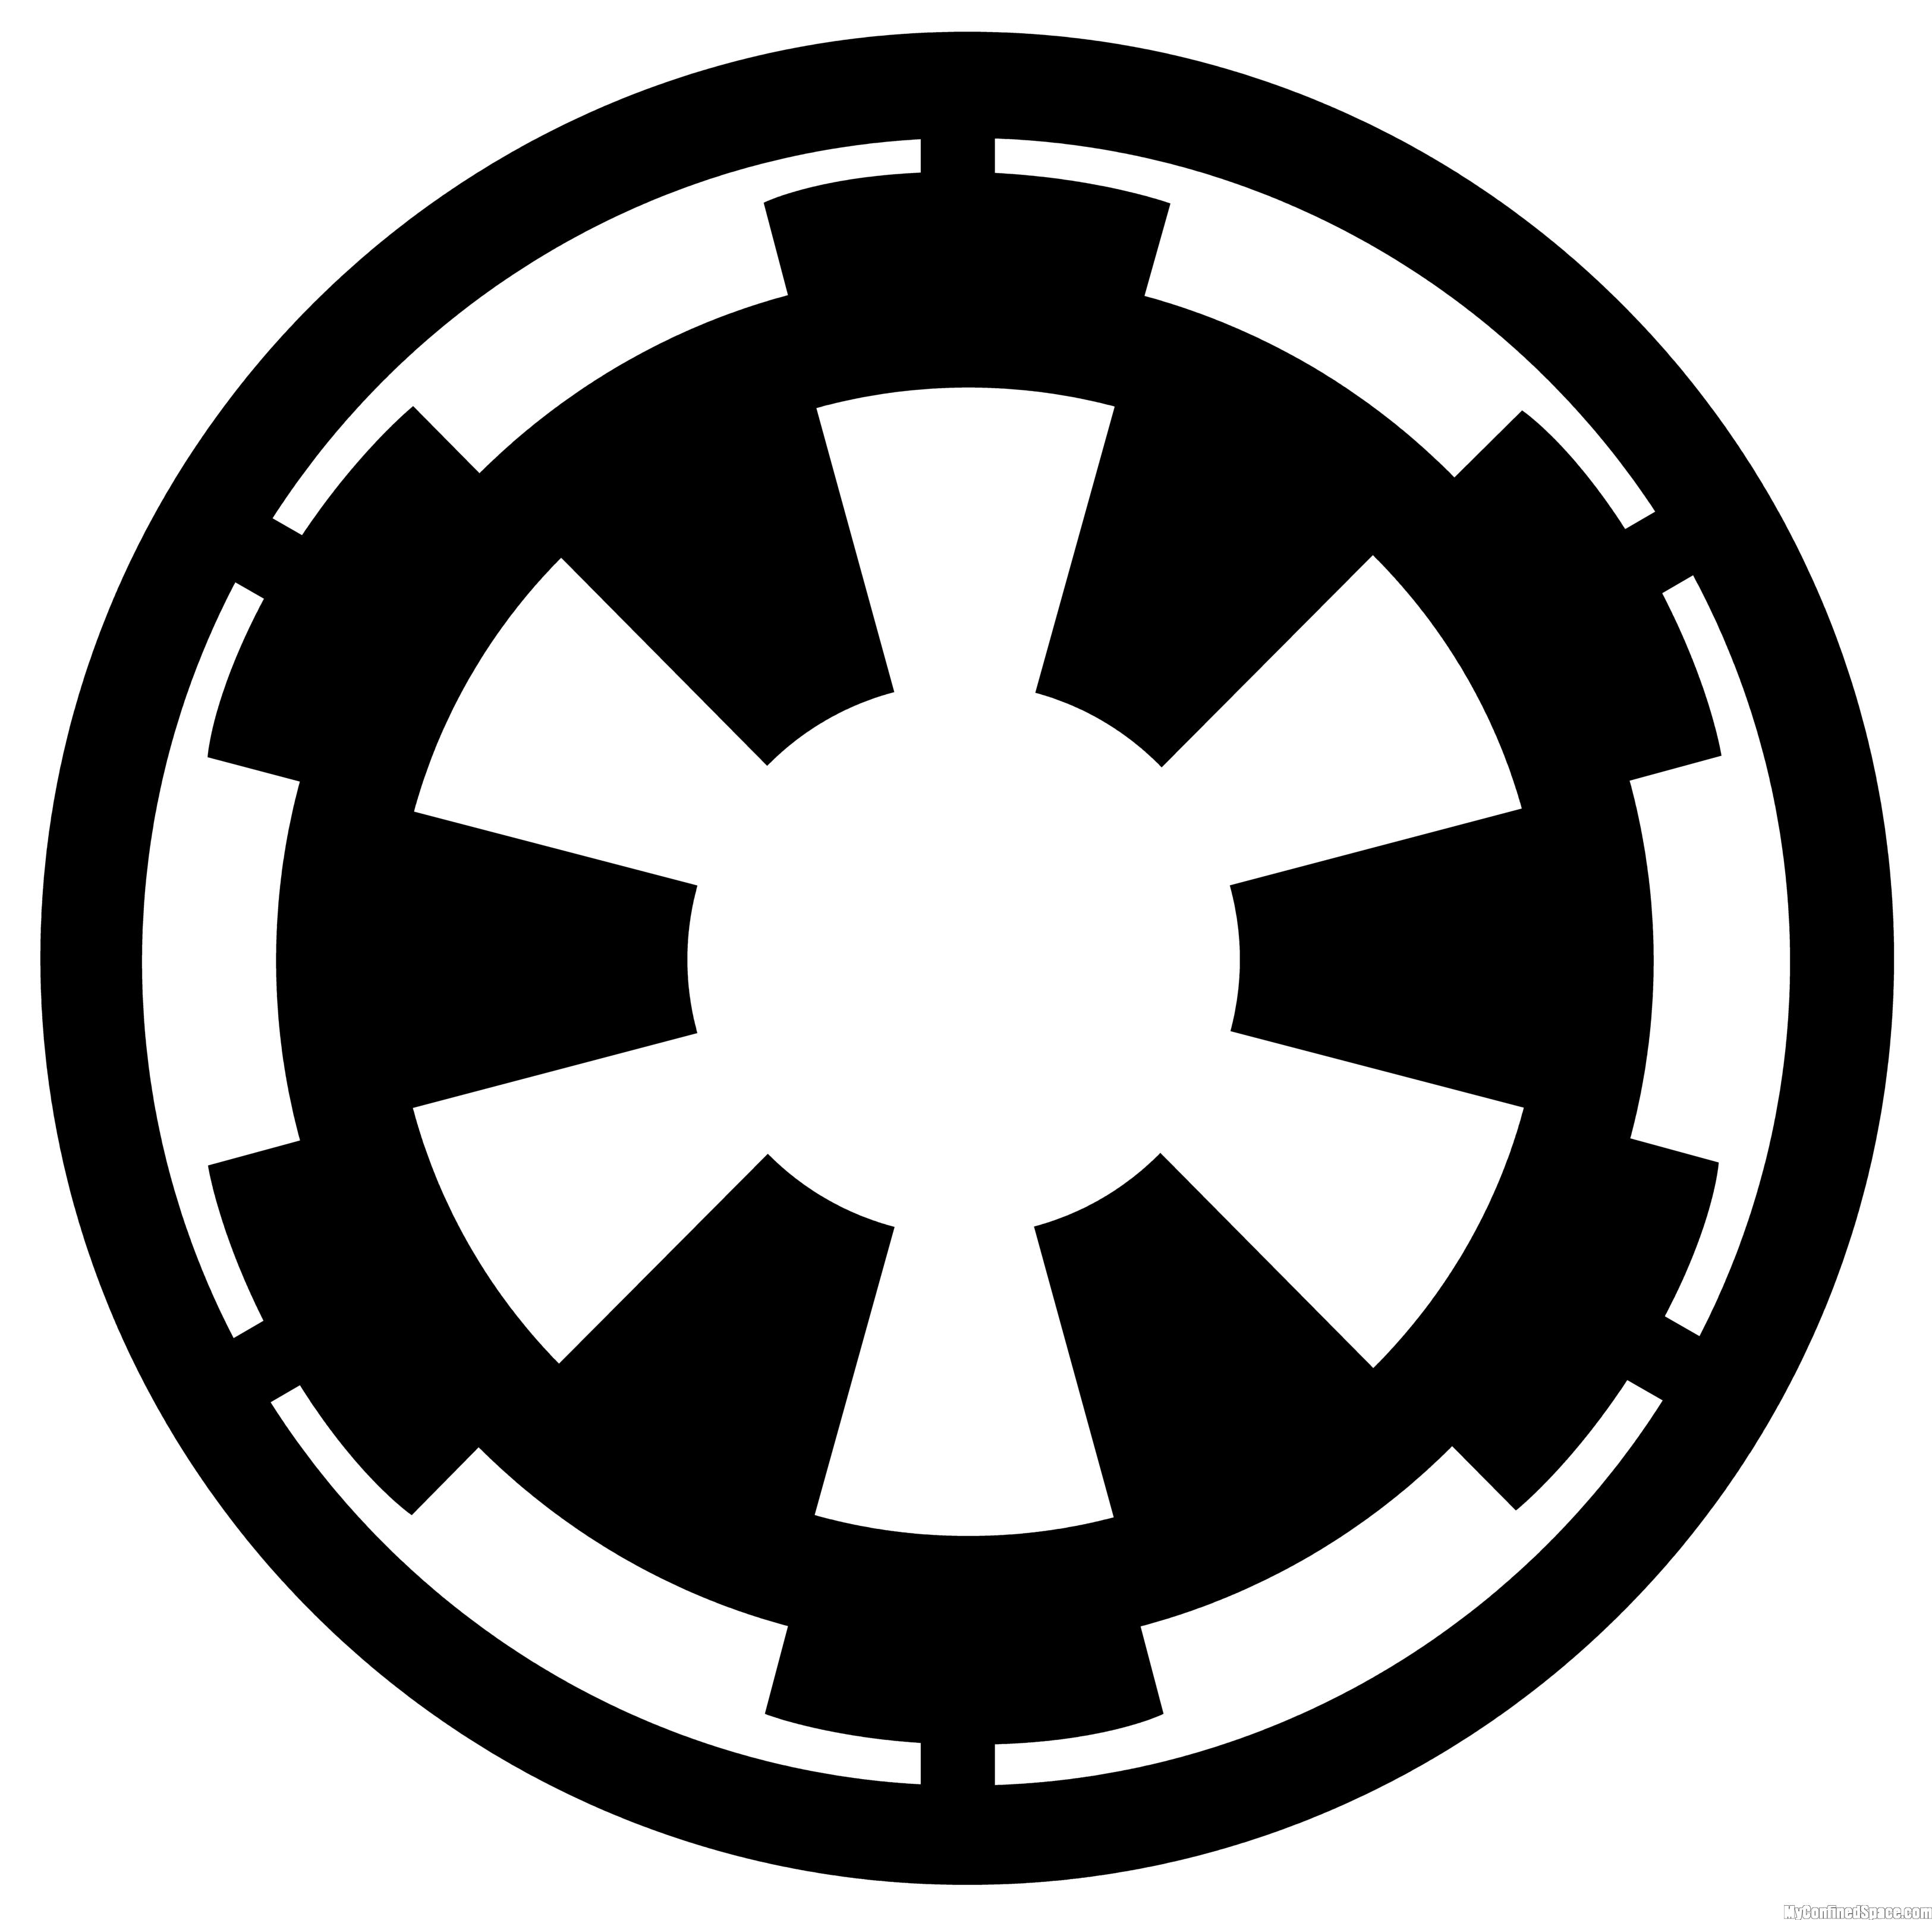 Galactic Empire 6 Inch Vinyl Decal Star Wars Silhouette Star Wars Stencil Star Wars Empire Logo